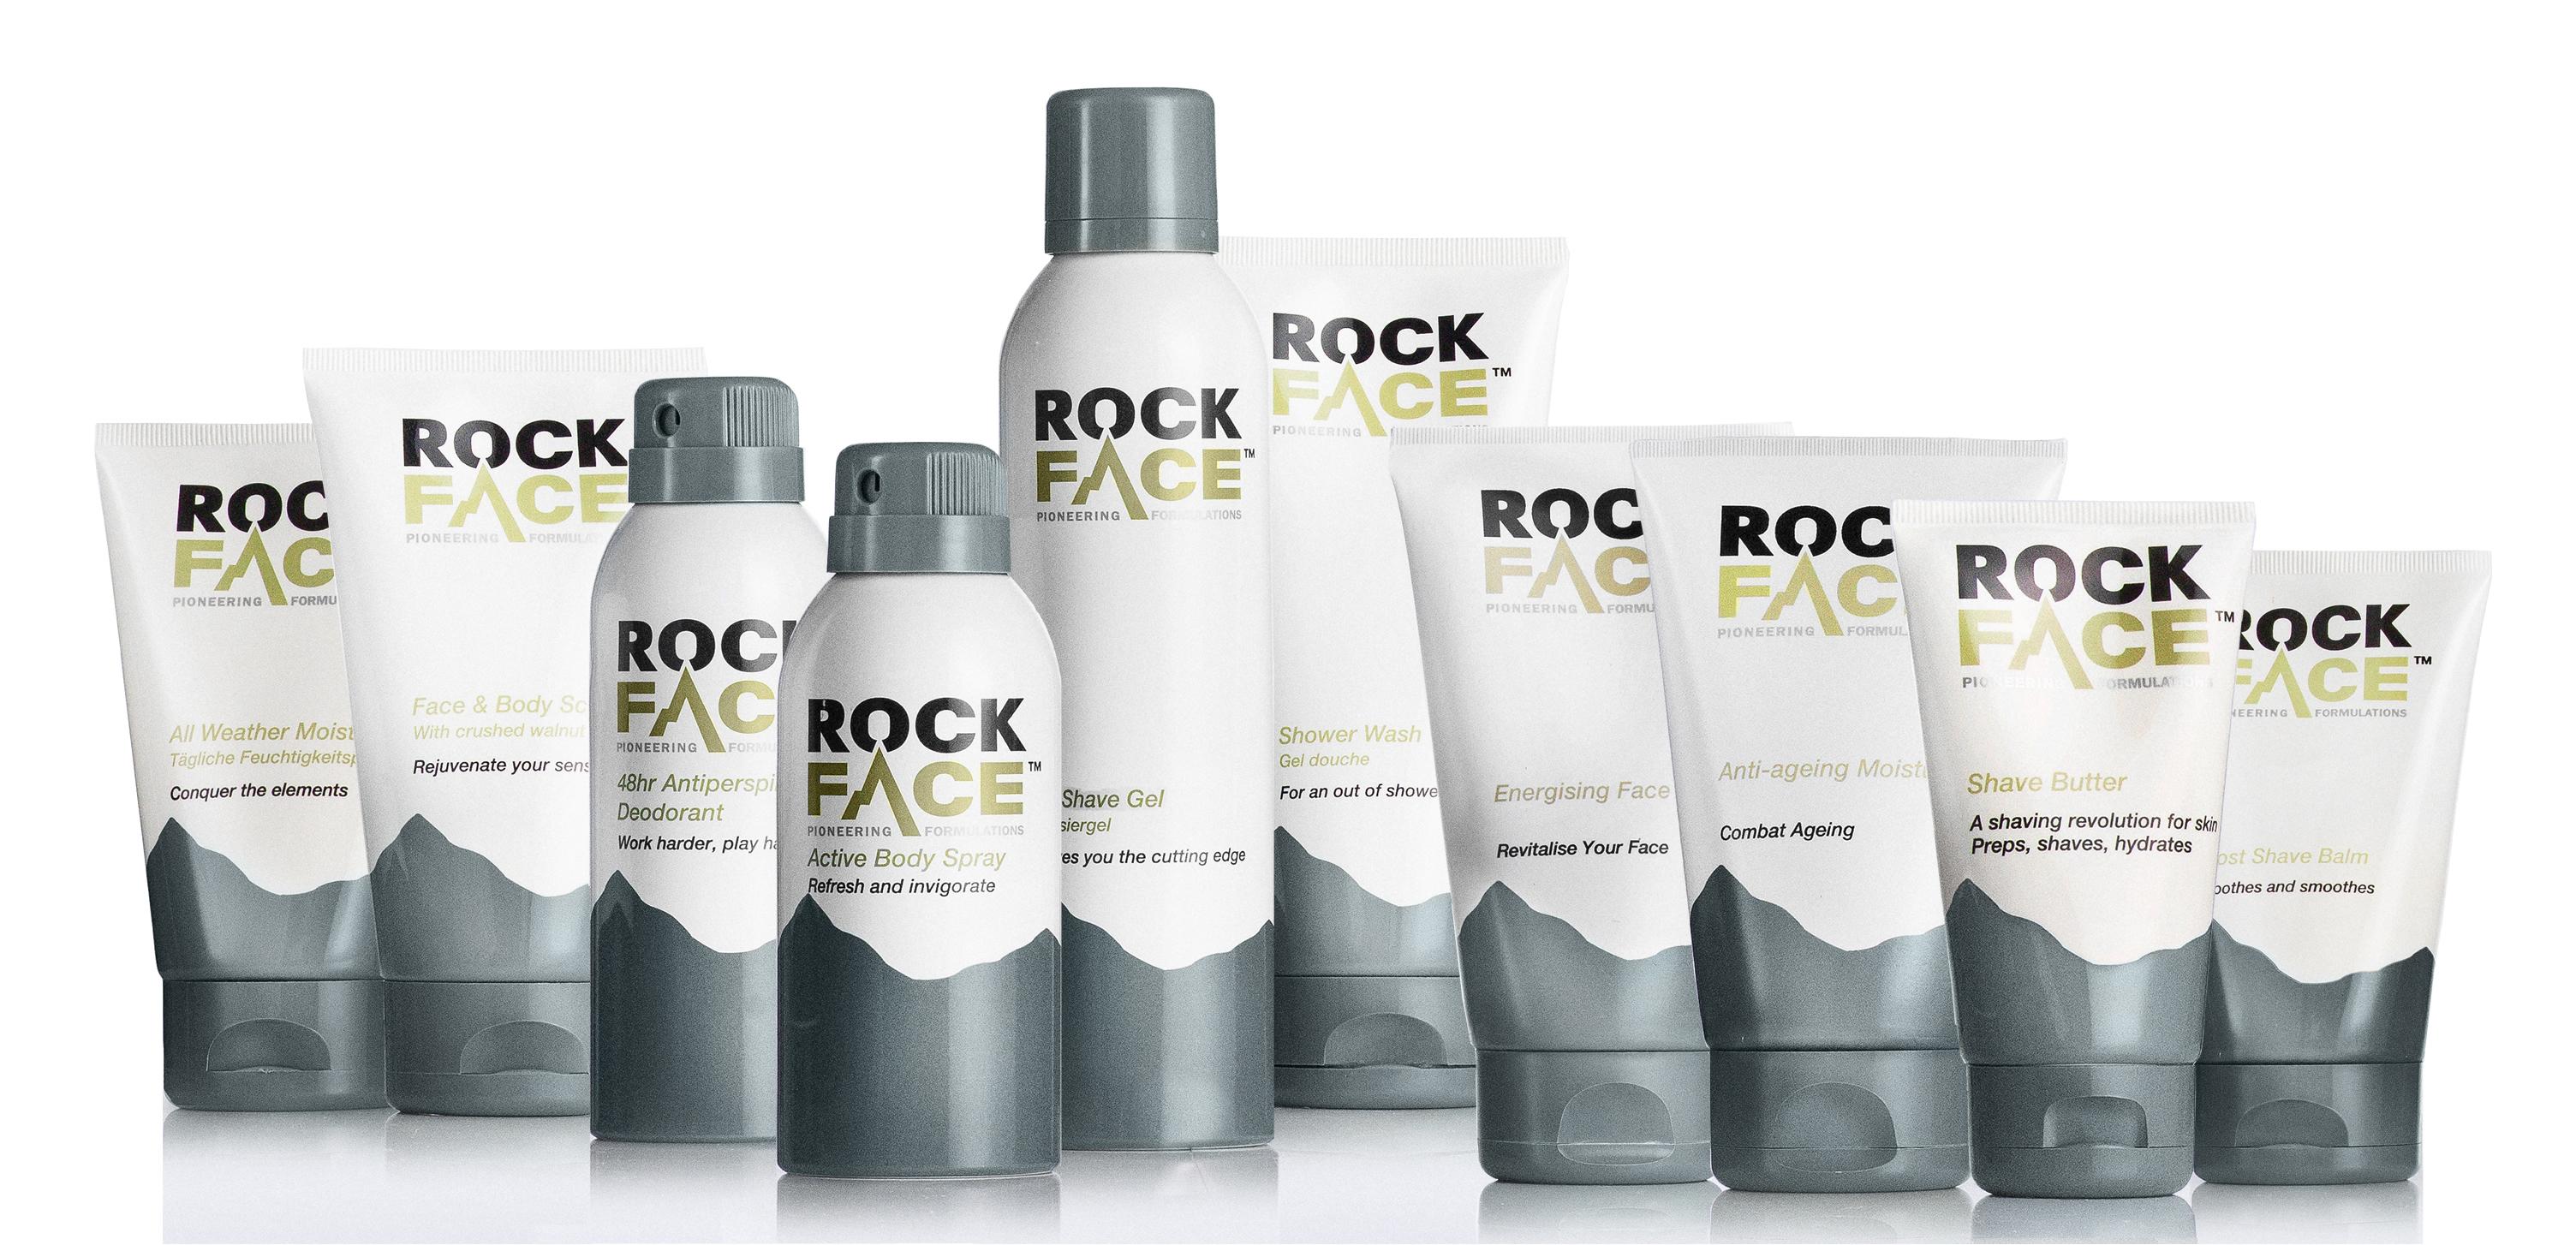 Rockface range shot bundled 2015